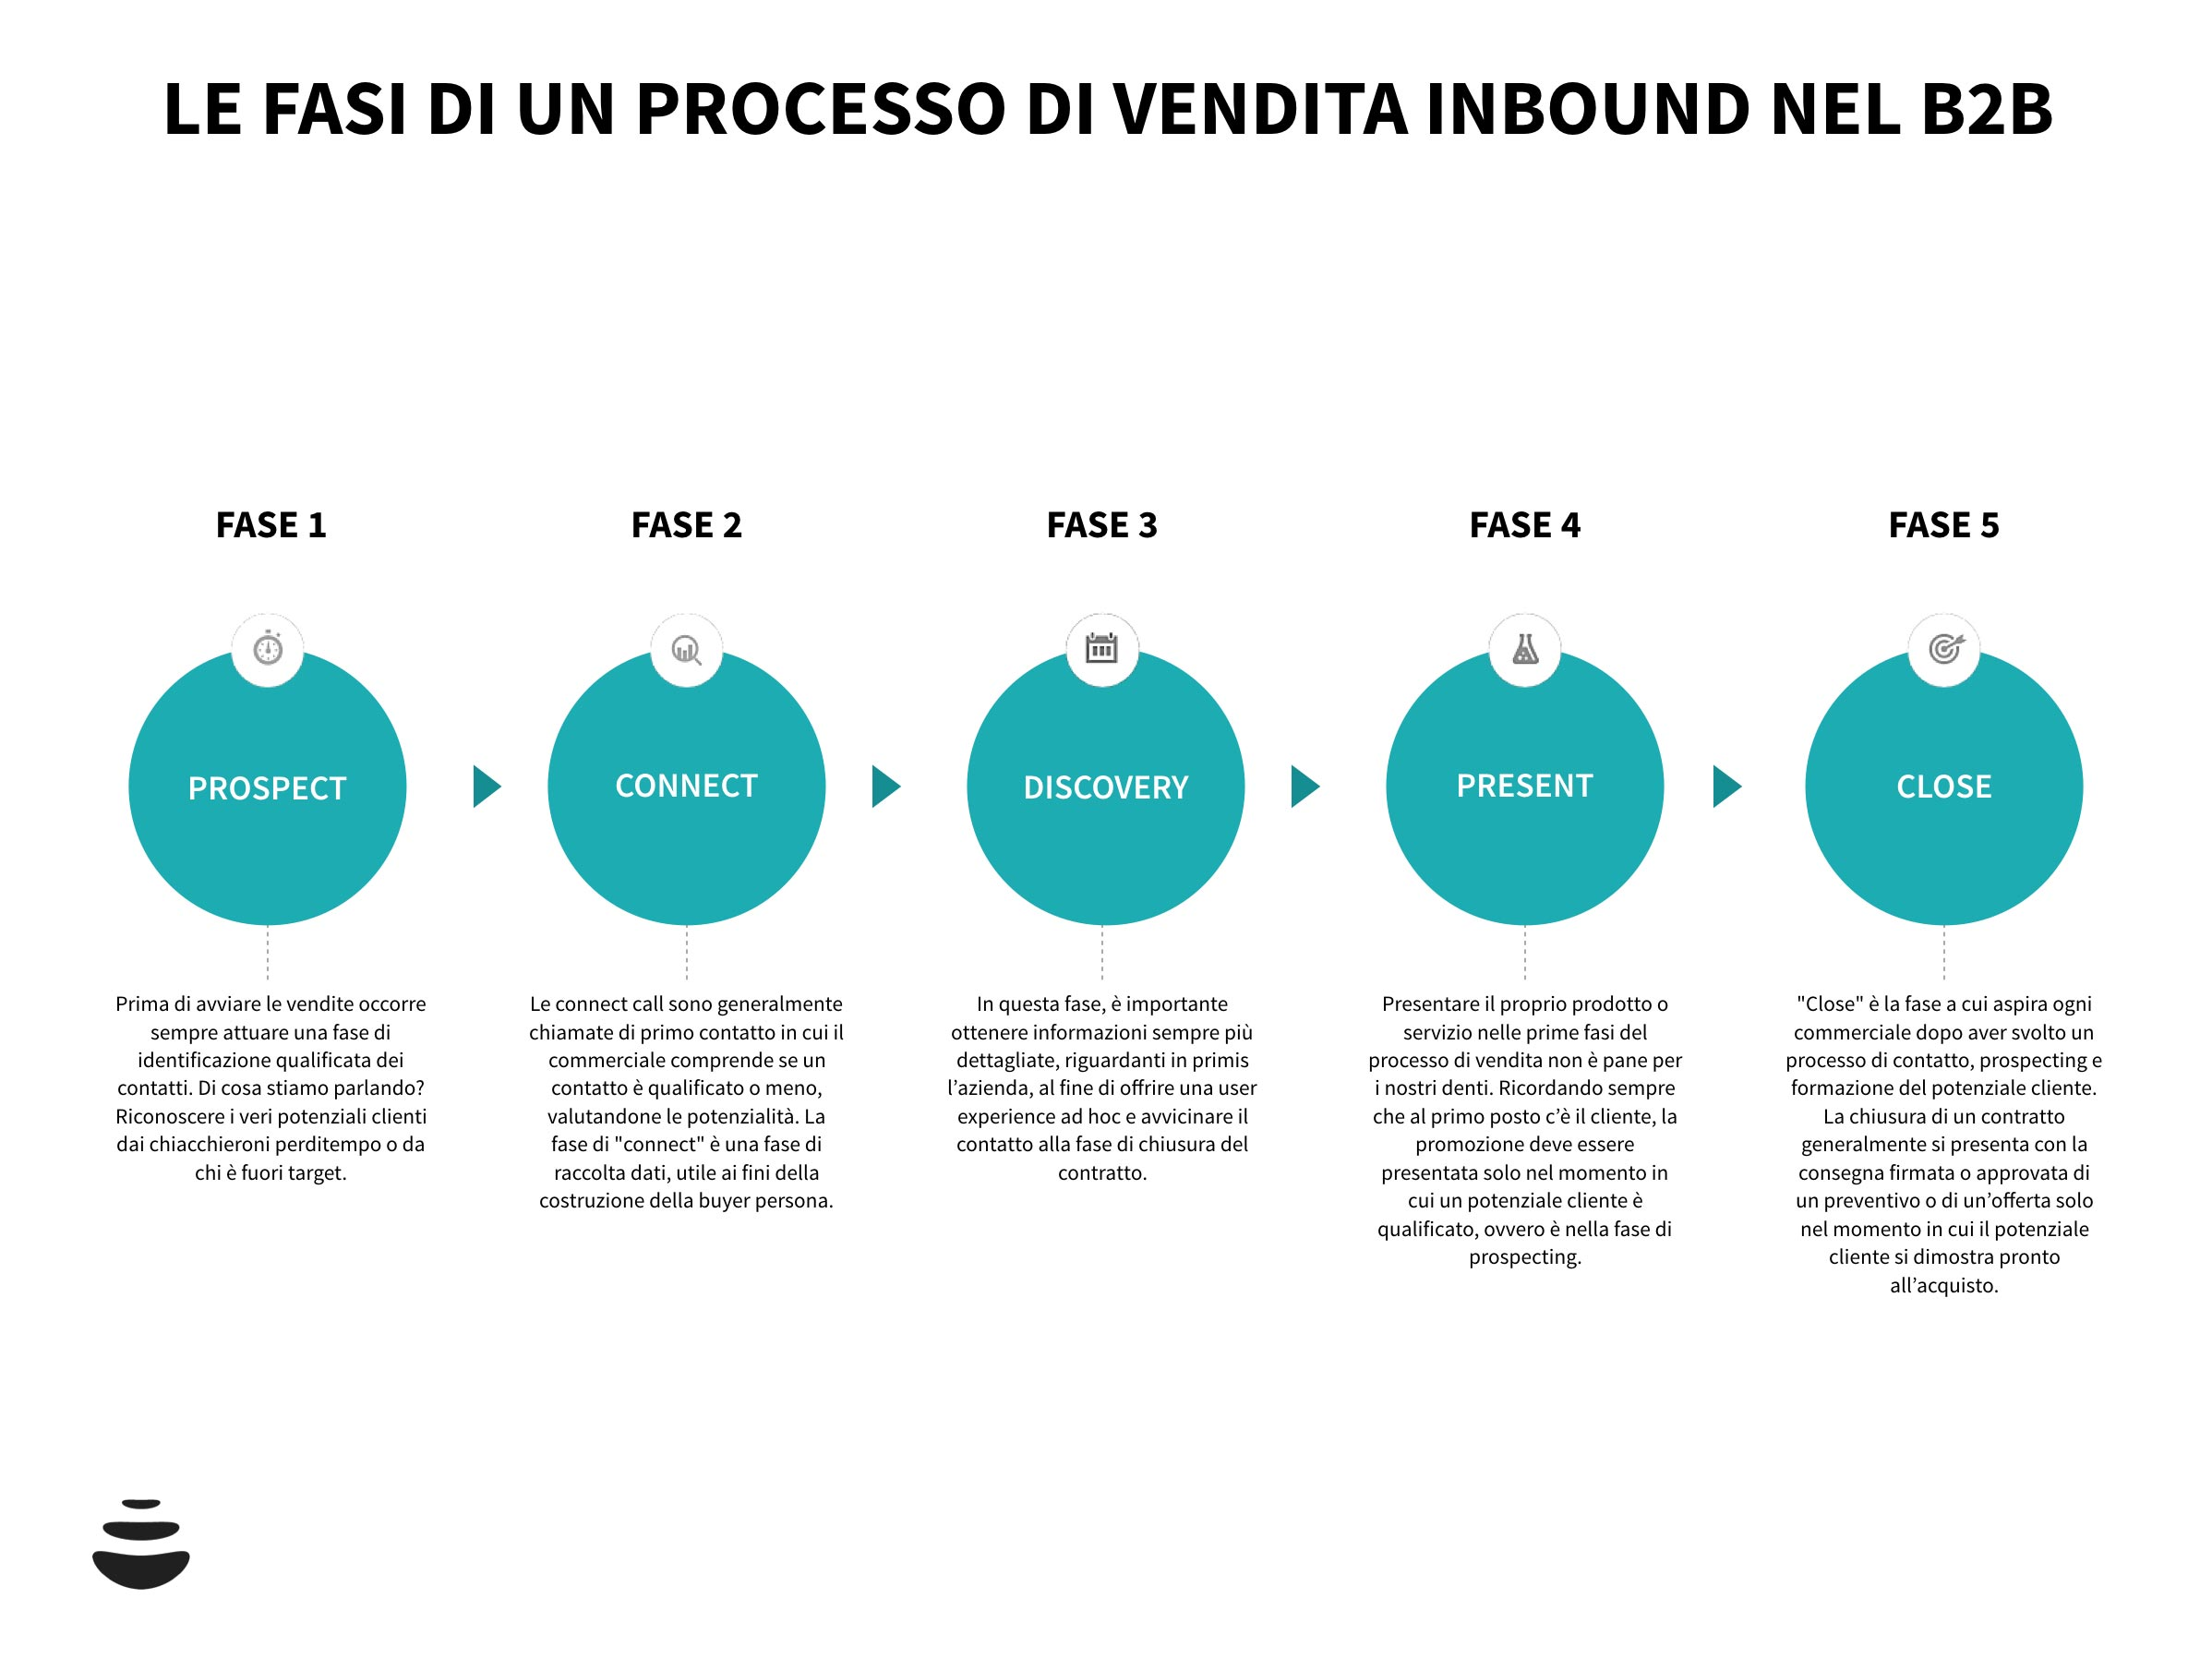 processo-vendita-inbound-sales-b2b-01